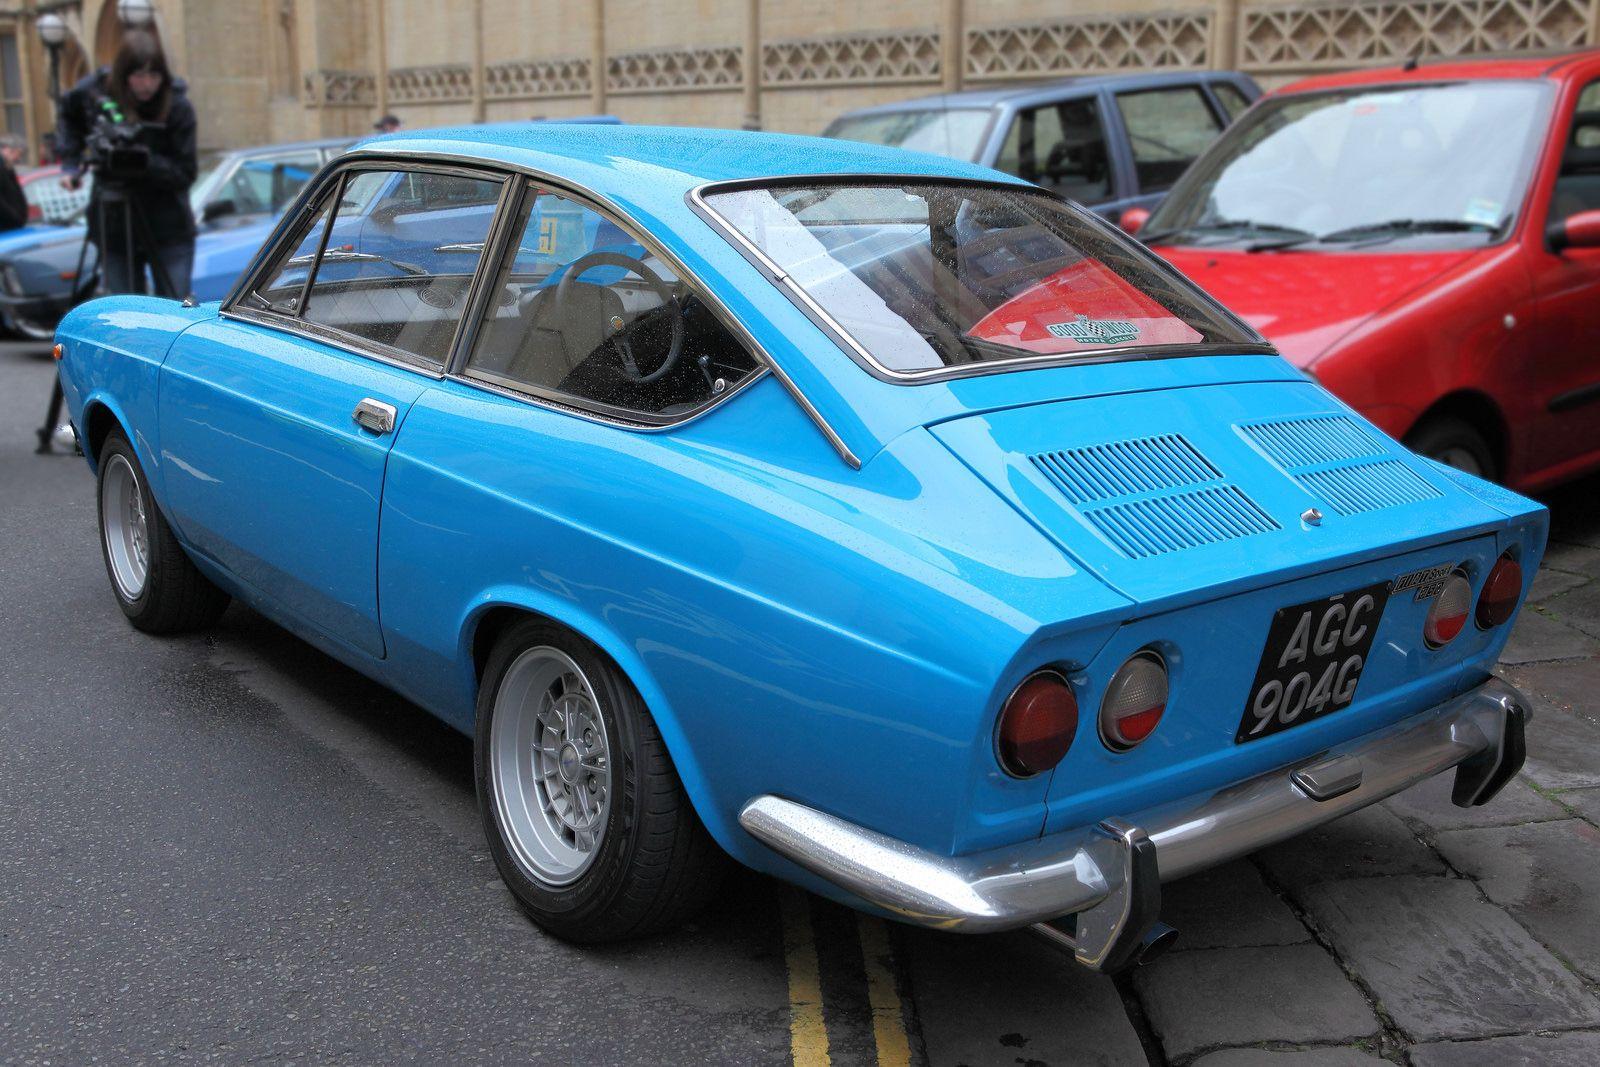 Fiat 850 Sport Coupe Rear Three Quarter View C1969 Fiat 850